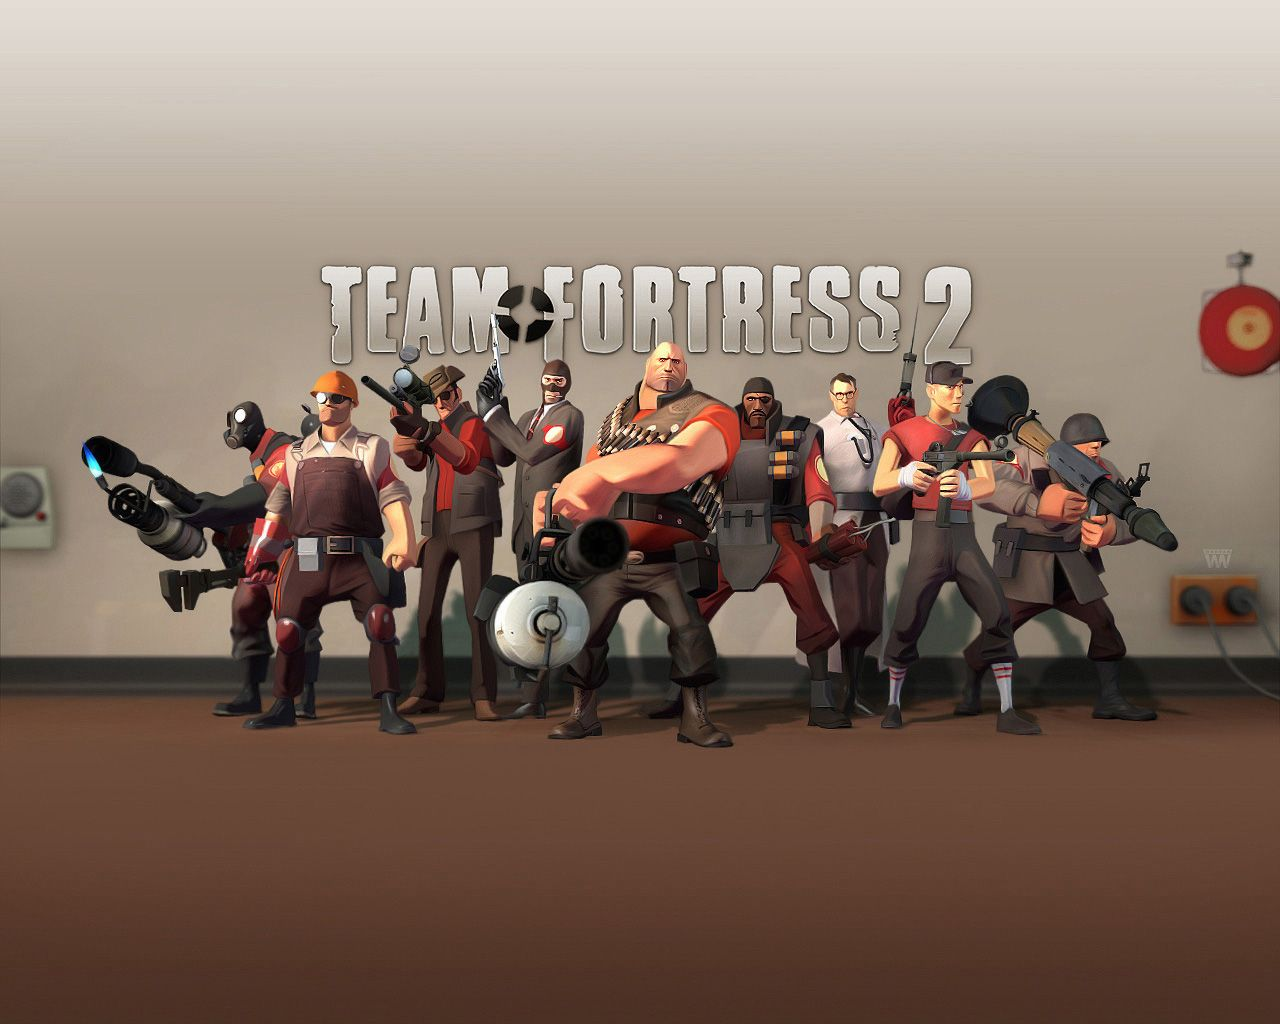 Team Fortress 2 Computer Wallpapers Desktop Backgrounds 1280x1024 Id 25866